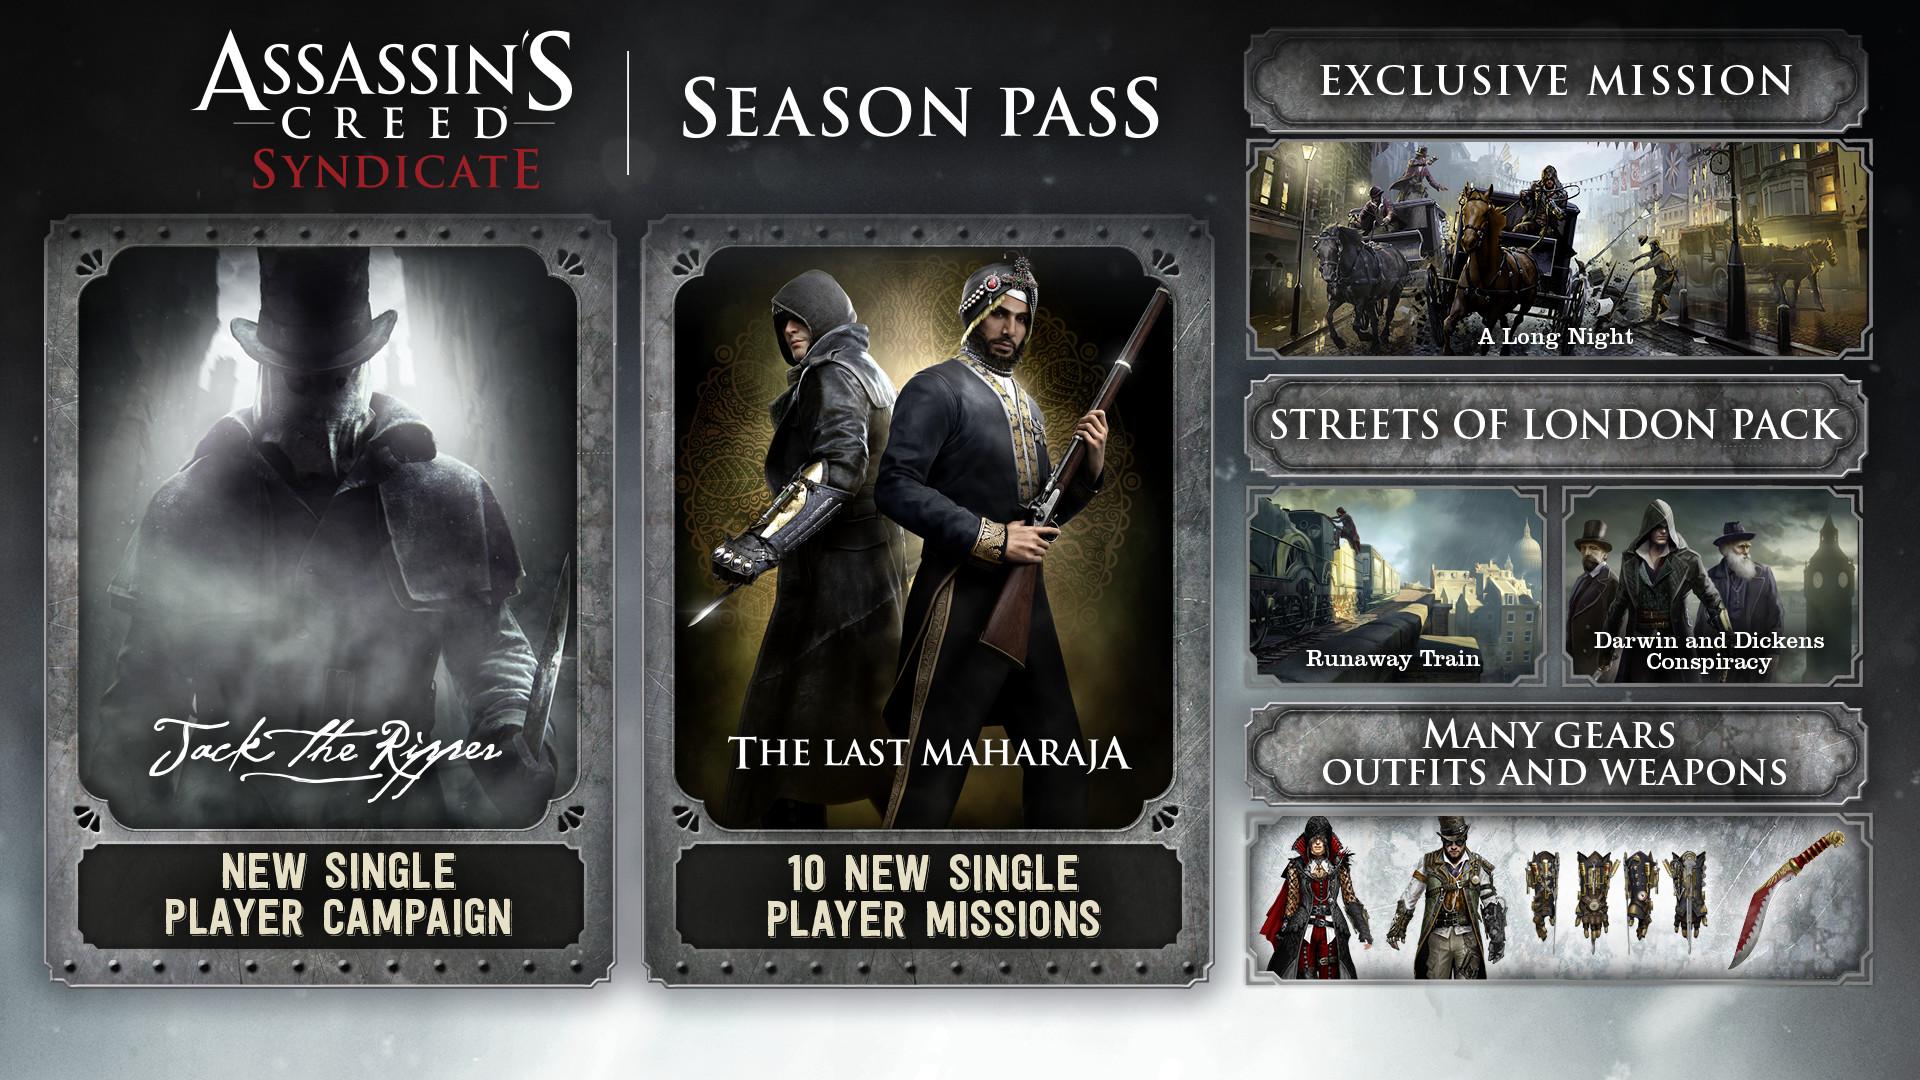 Assassins Creed Syndicate Gold Edition v 1.5 + DLCs repack Mr DJ version download